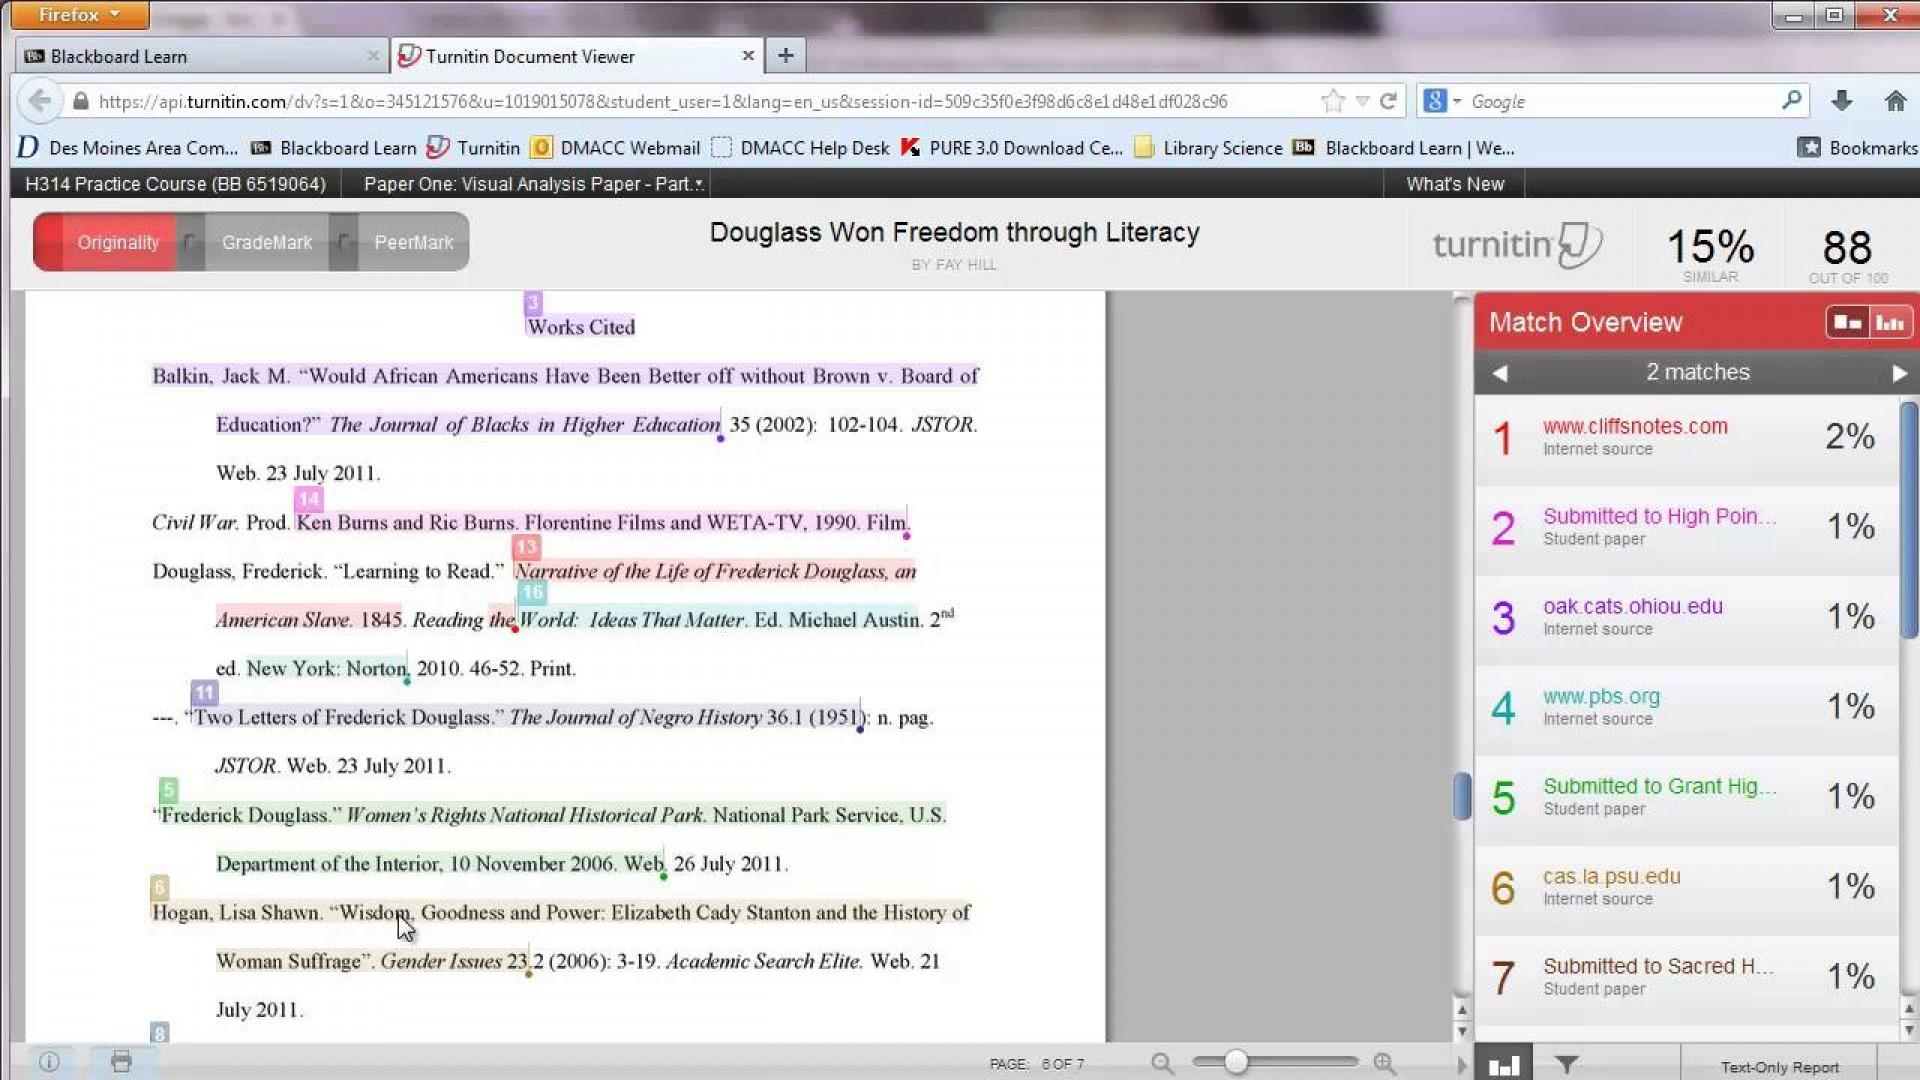 006 Essay Plagiarism Checker Maxresdefault Unforgettable Full Paper Free Turnitin Reddit 1920